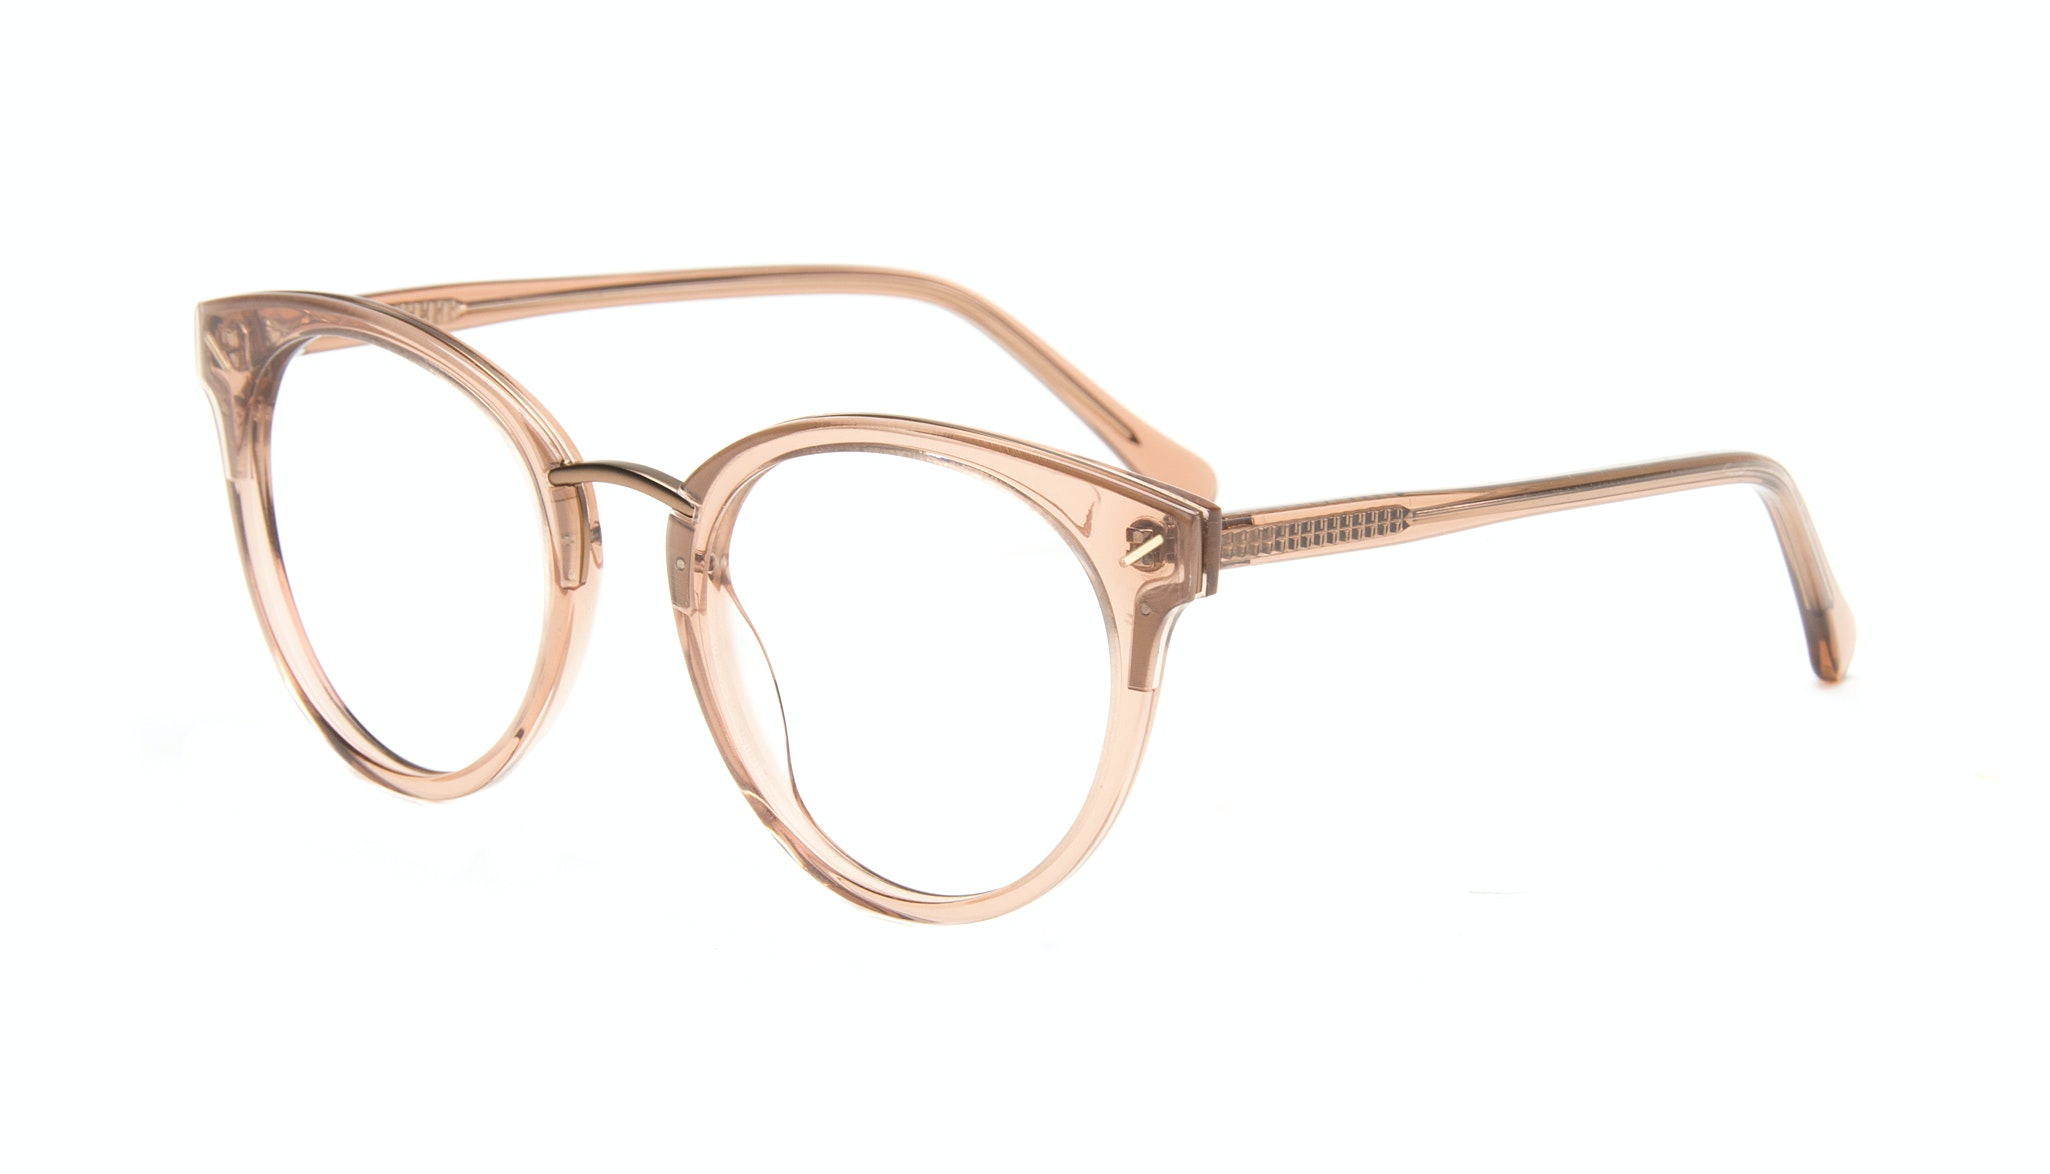 Affordable Fashion Glasses Round Eyeglasses Women Element Rose Tilt